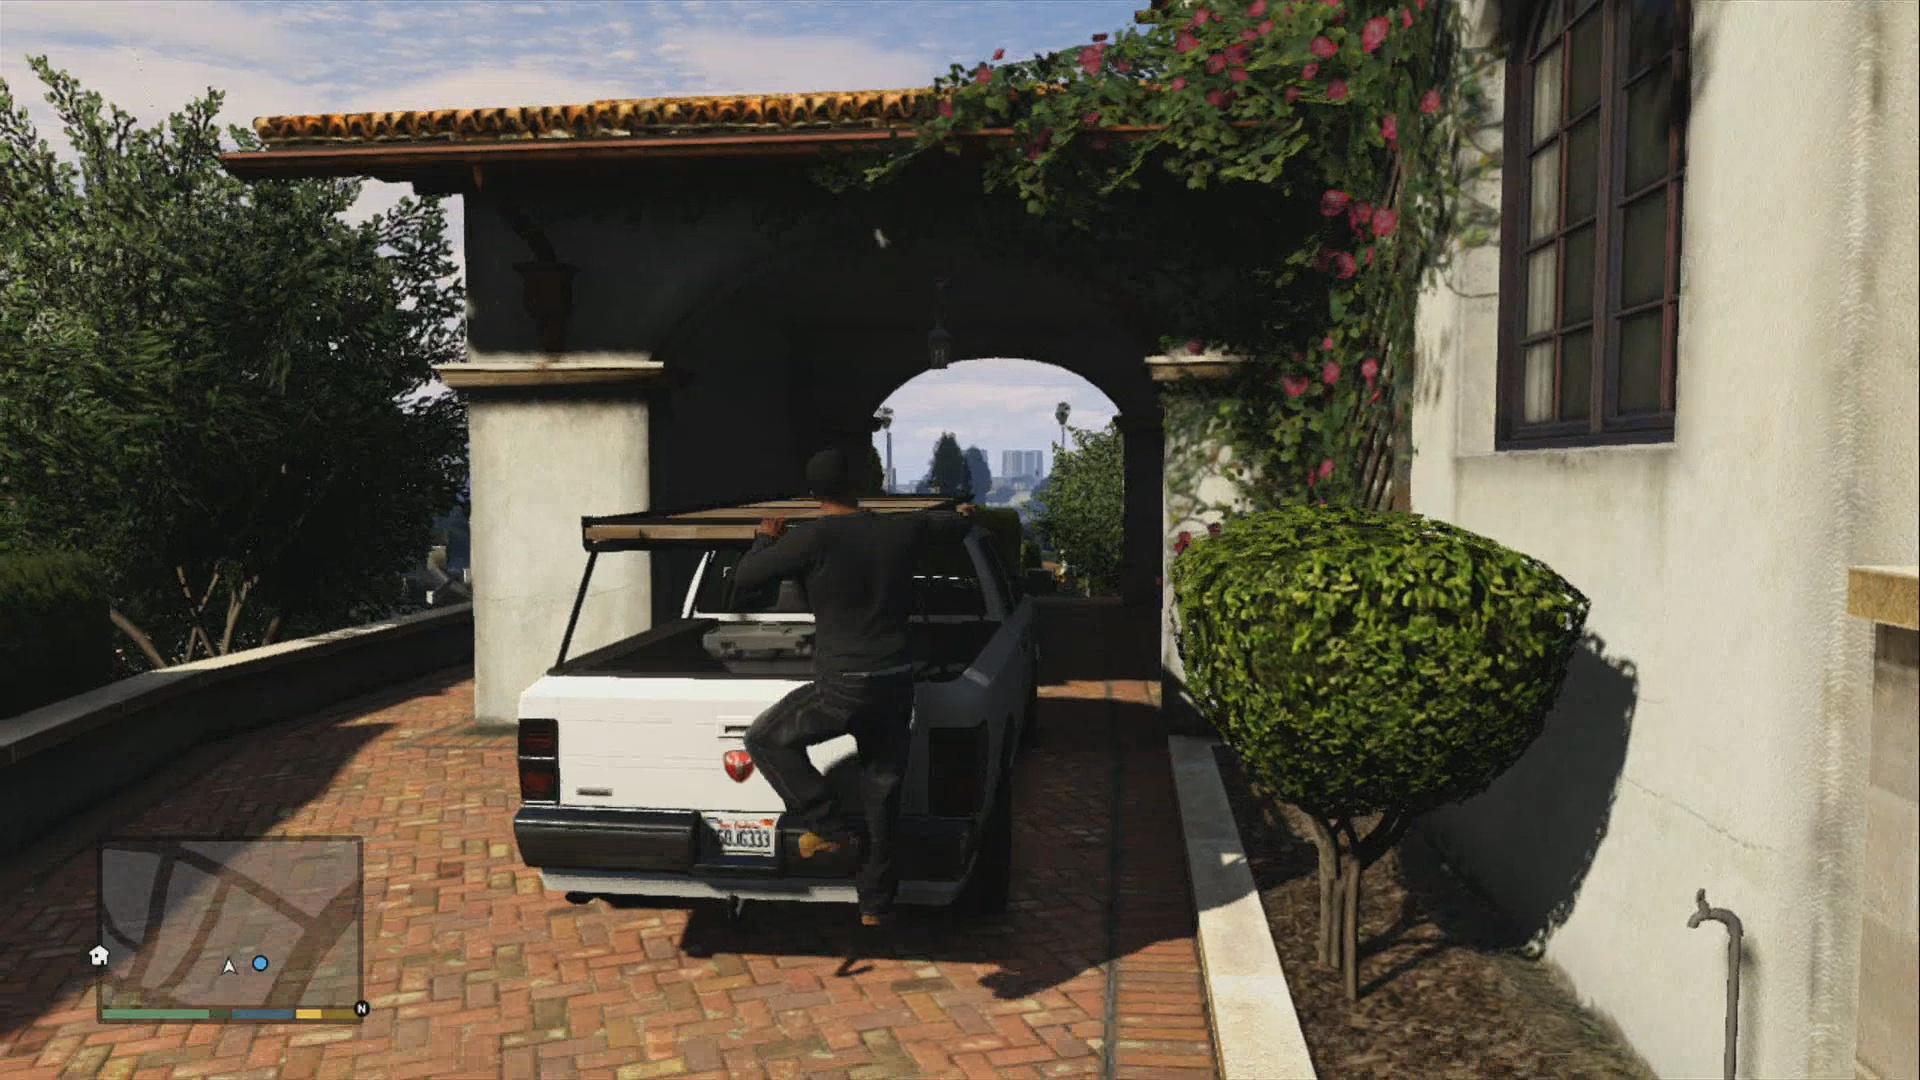 Gta V Guide Repossession Stealing Michael S Car